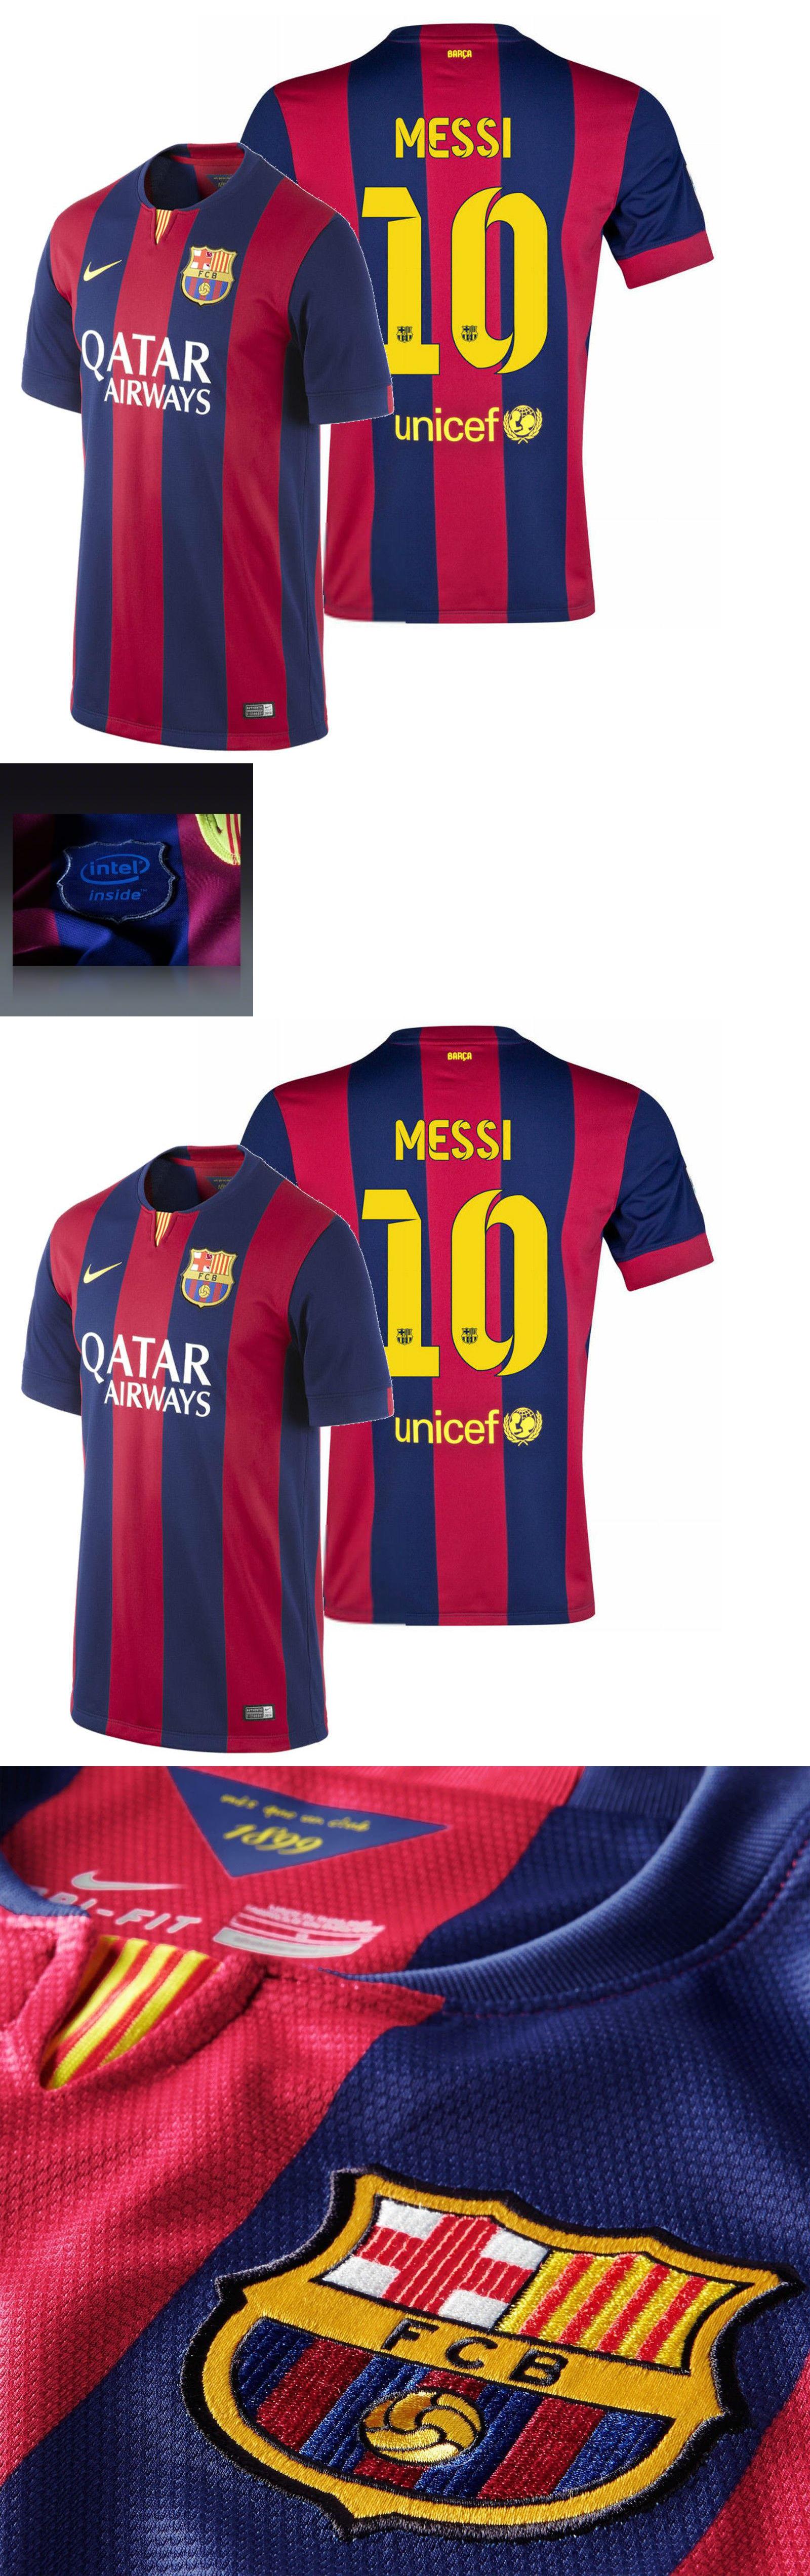 super cute 42b11 f5eb6 where to buy messi jersey